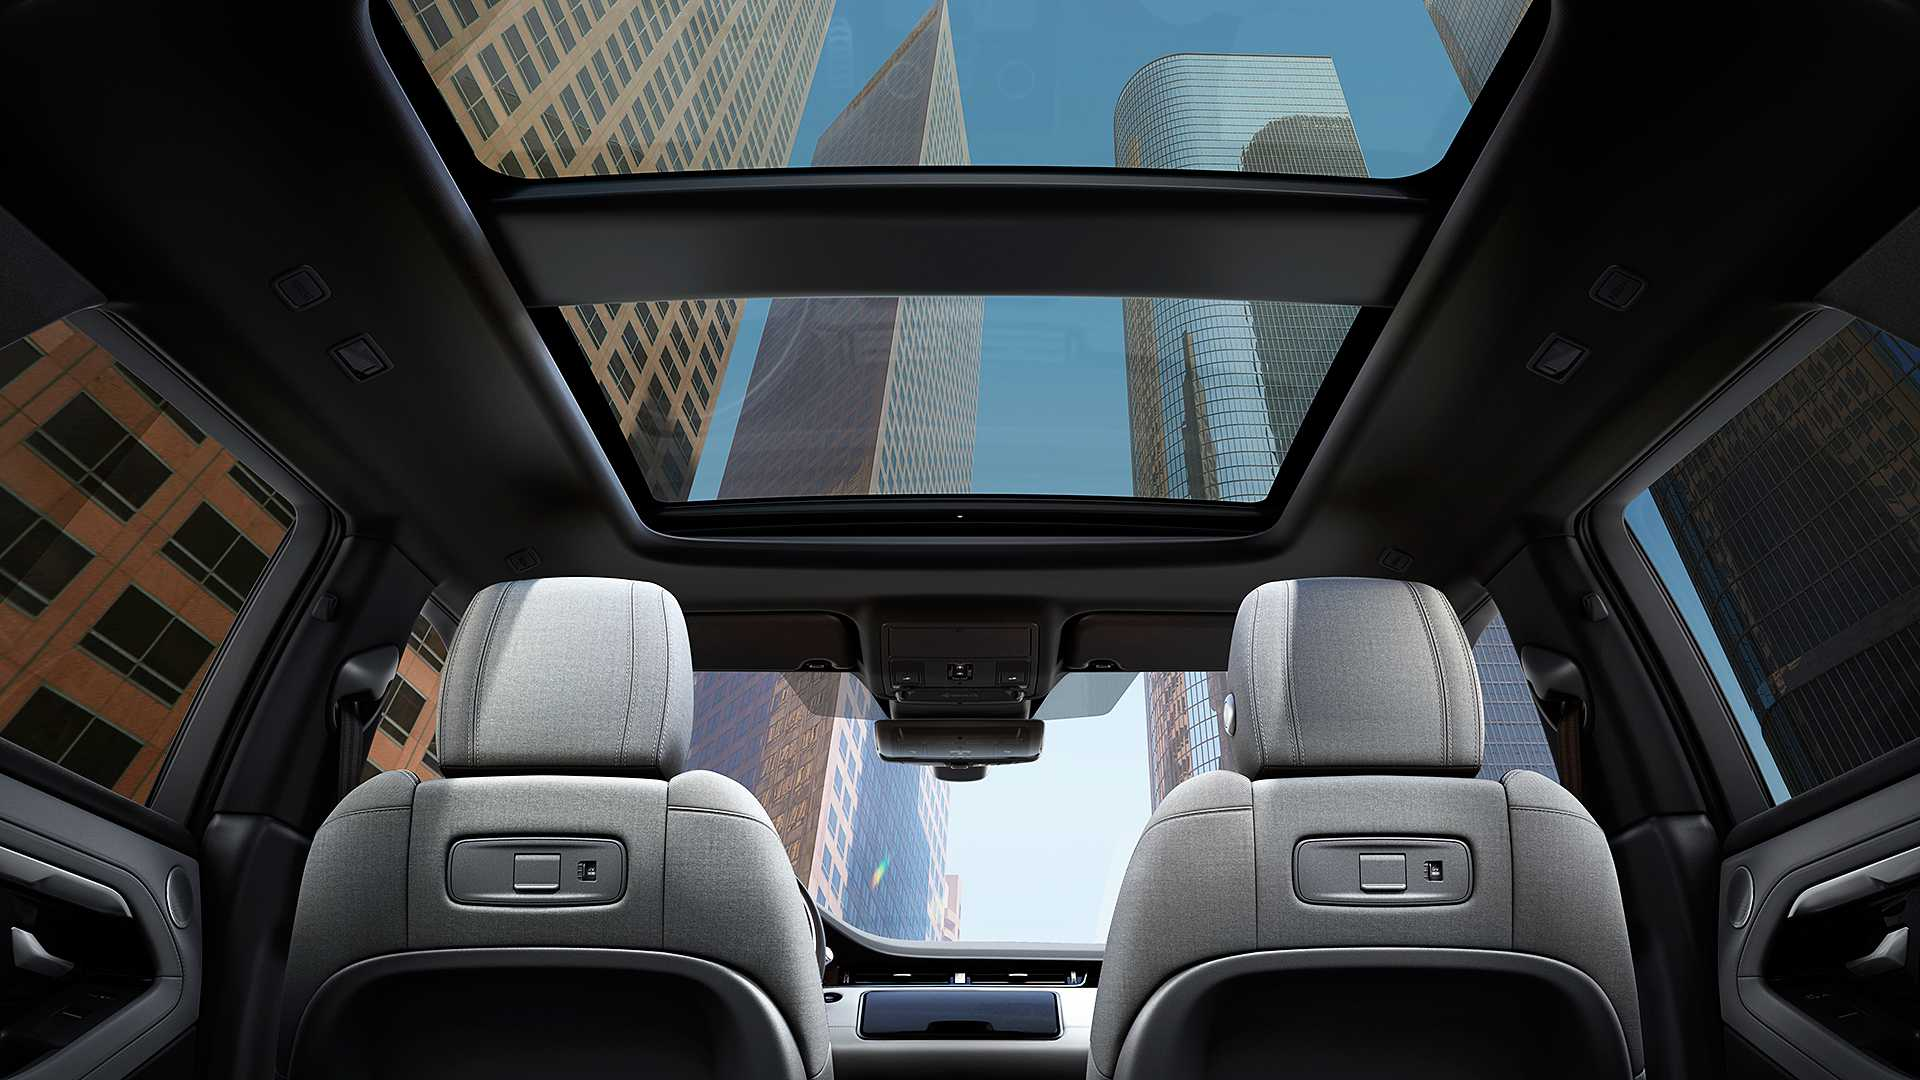 ada358801 Oficial: Novo Range Rover Evoque 2020 cresce e se eletrifica